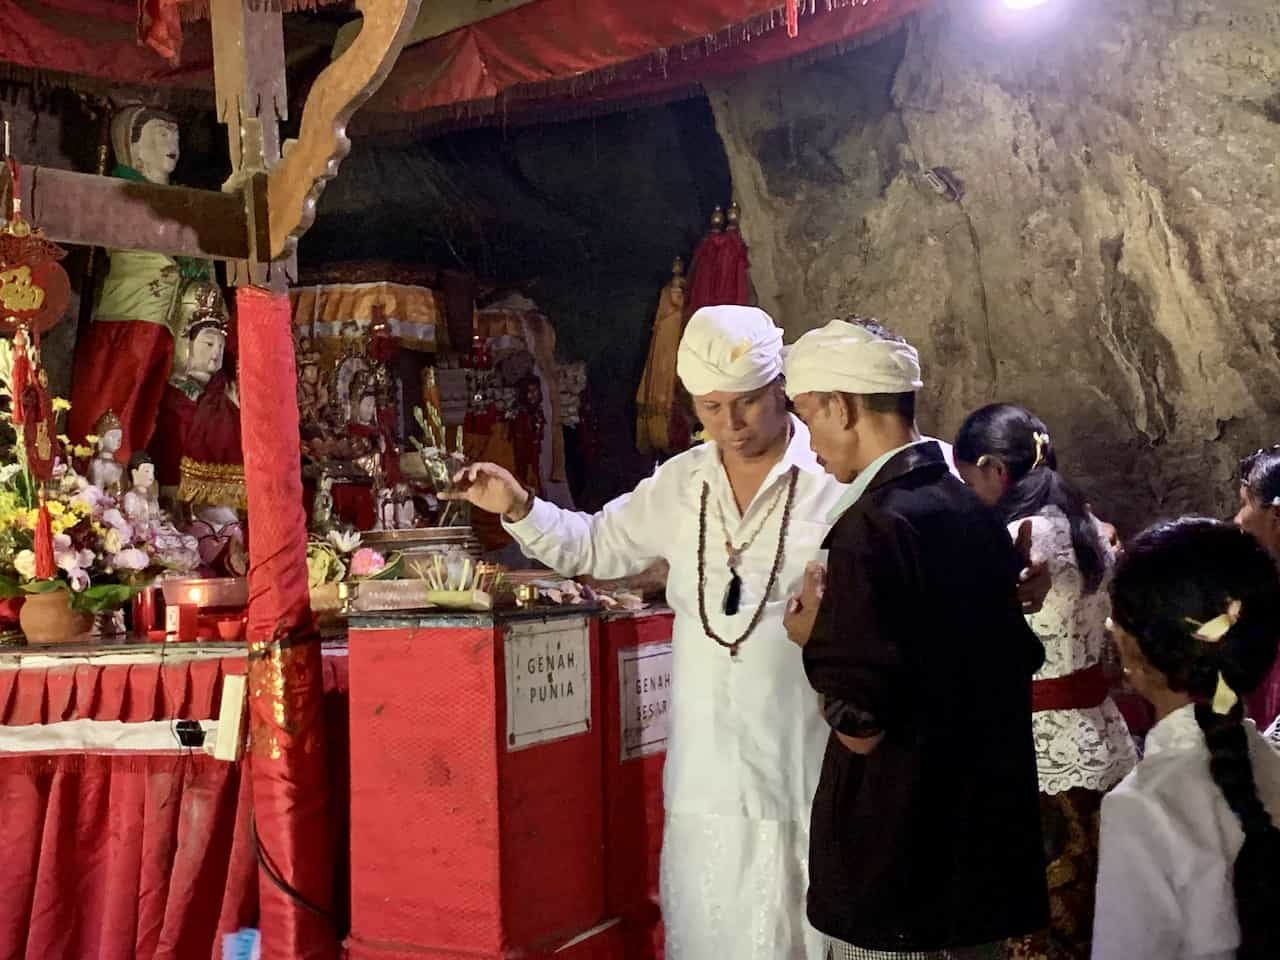 Goa Giri Putri Cave Temple Ceremony